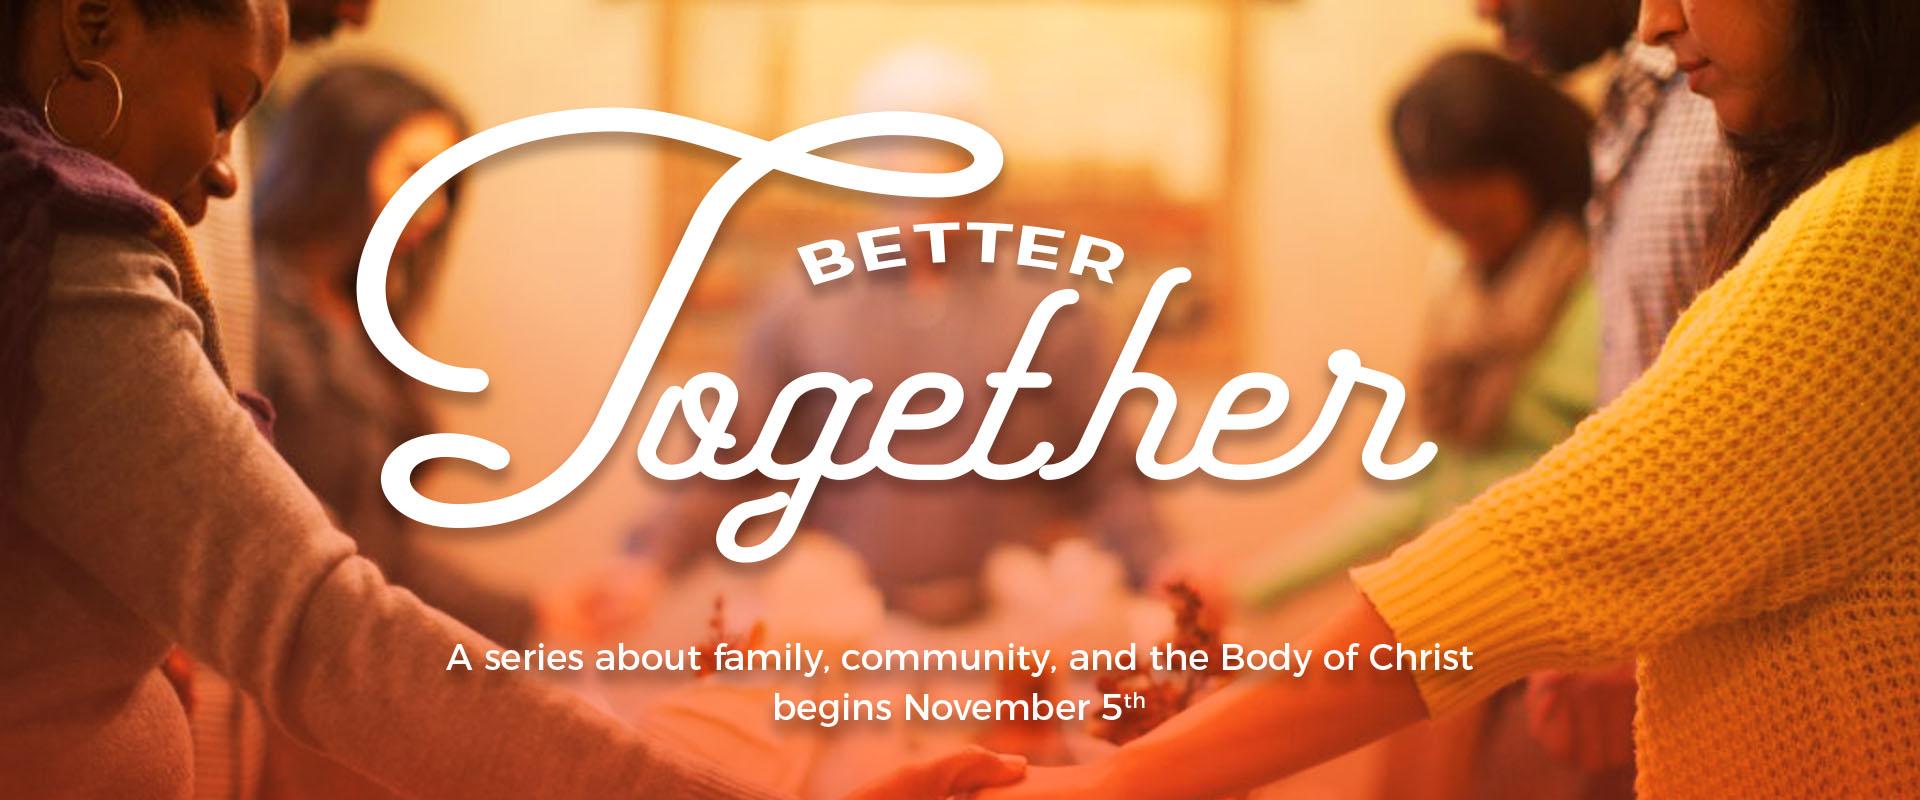 Better Together - 4 Part Sermon Series  Pastor Jamaal   November 2017    iTunes    Google Play    Sound Cloud  (Full Series)